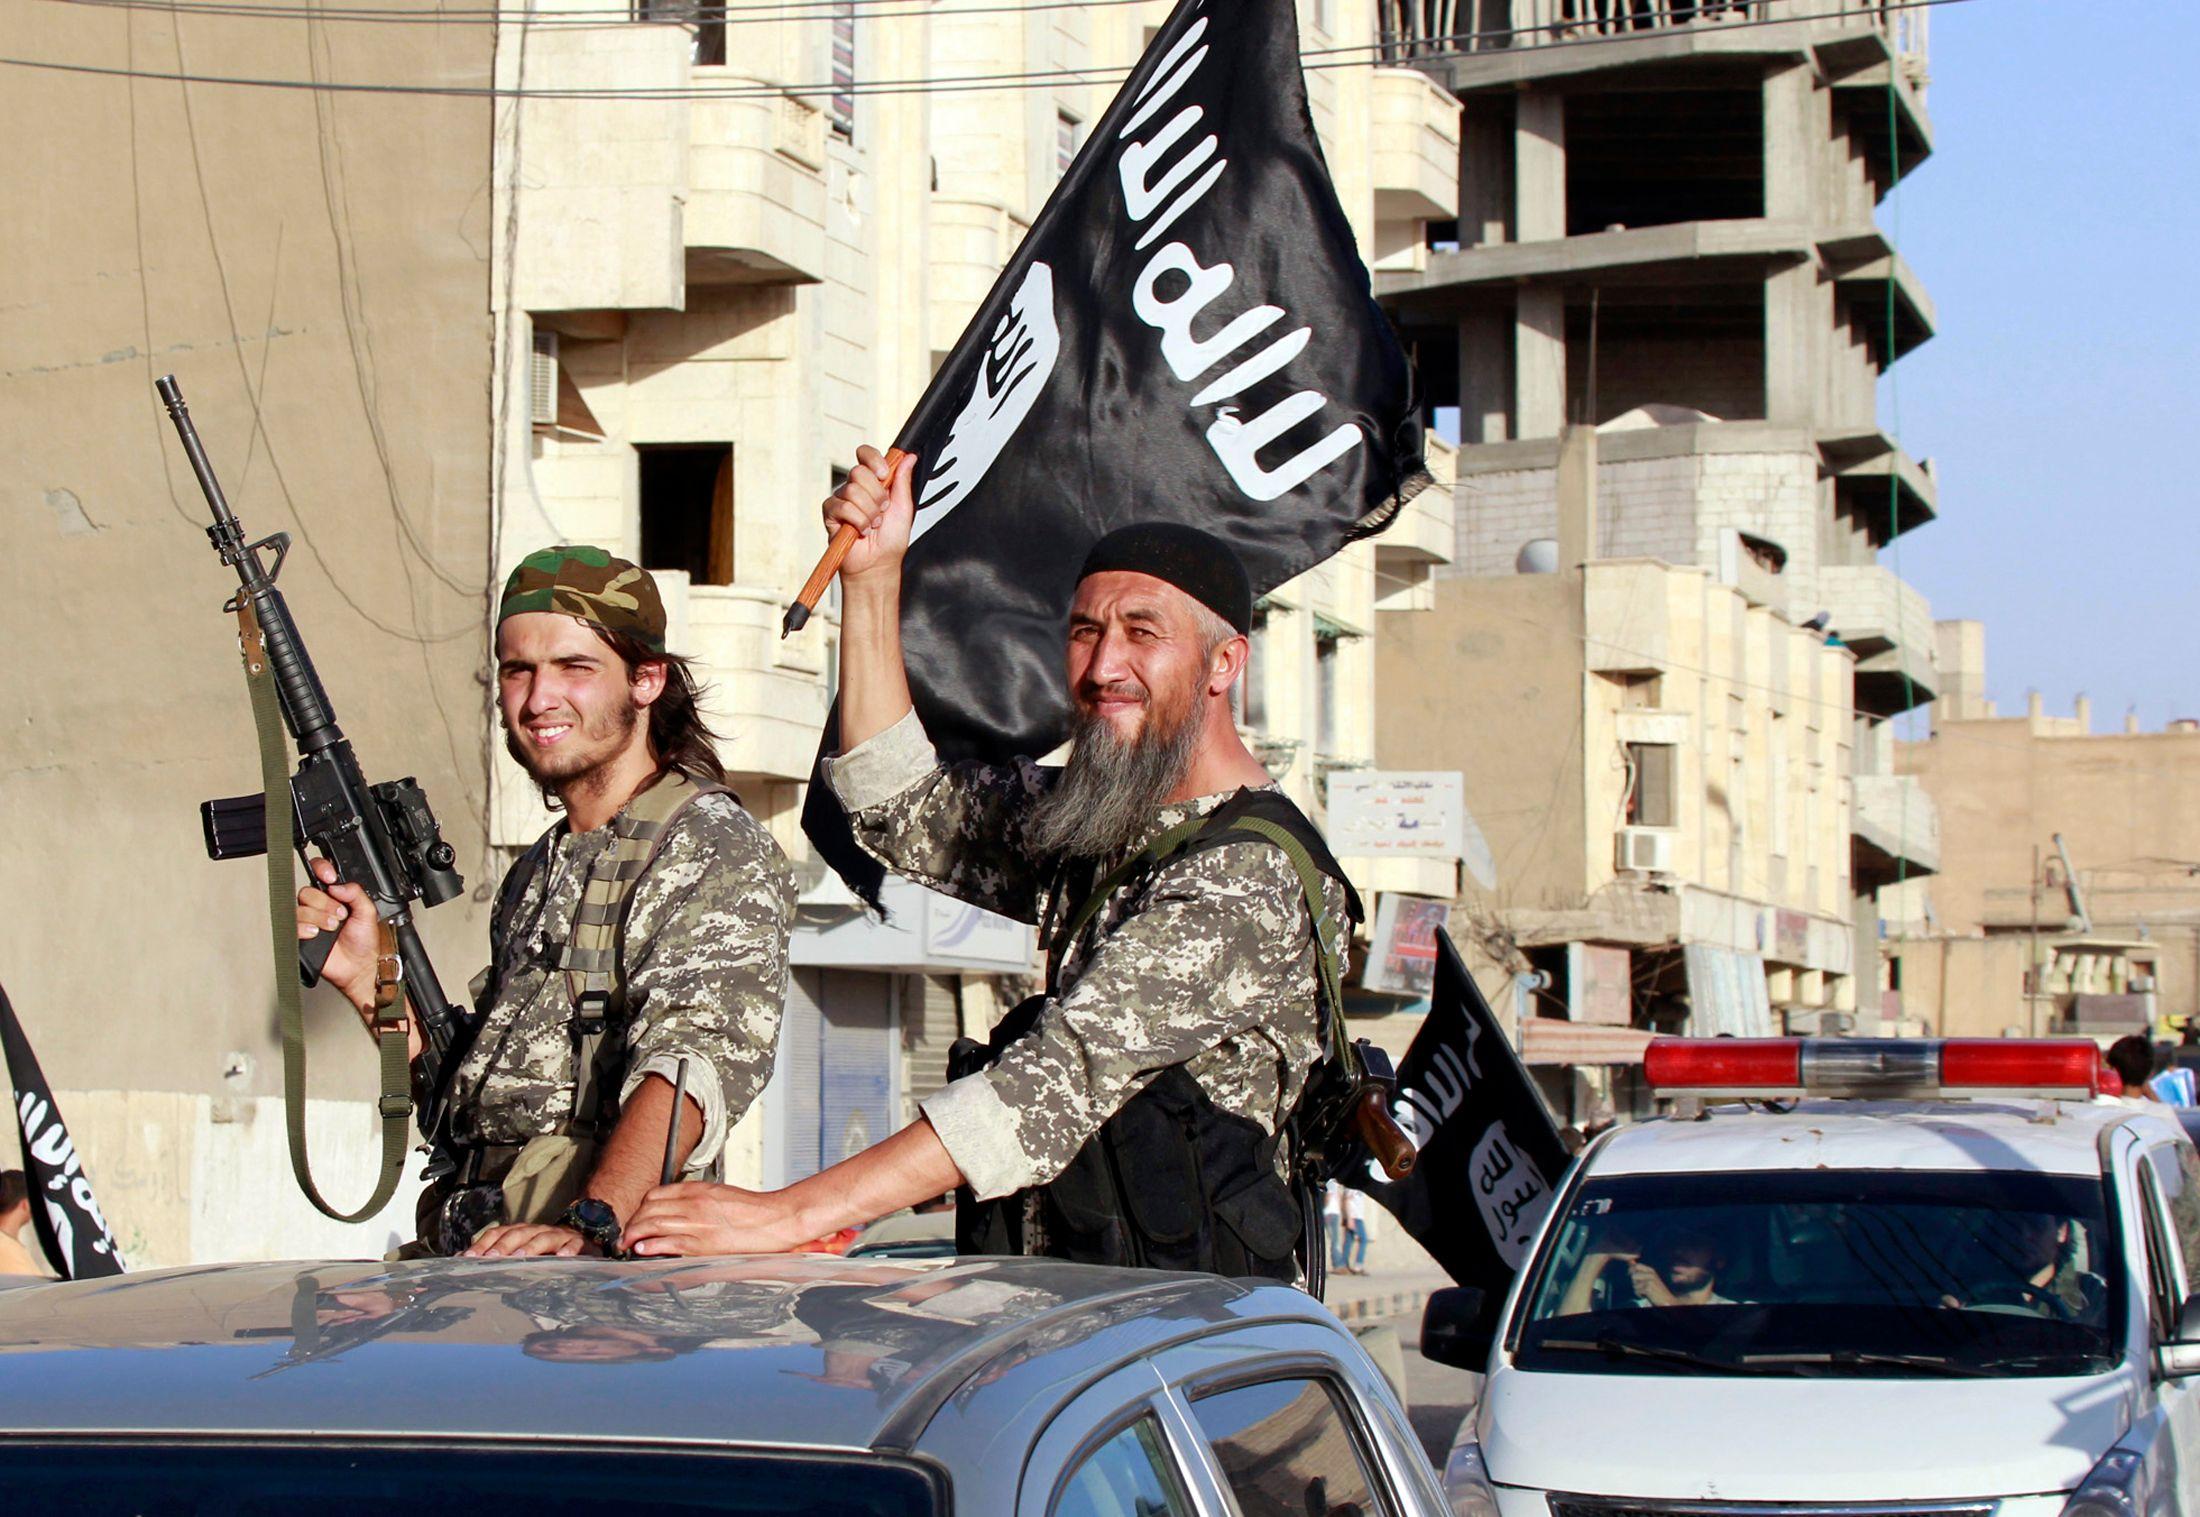 Etat islamique : les djihadistes filment leurs massacres en Syrie et en Irak